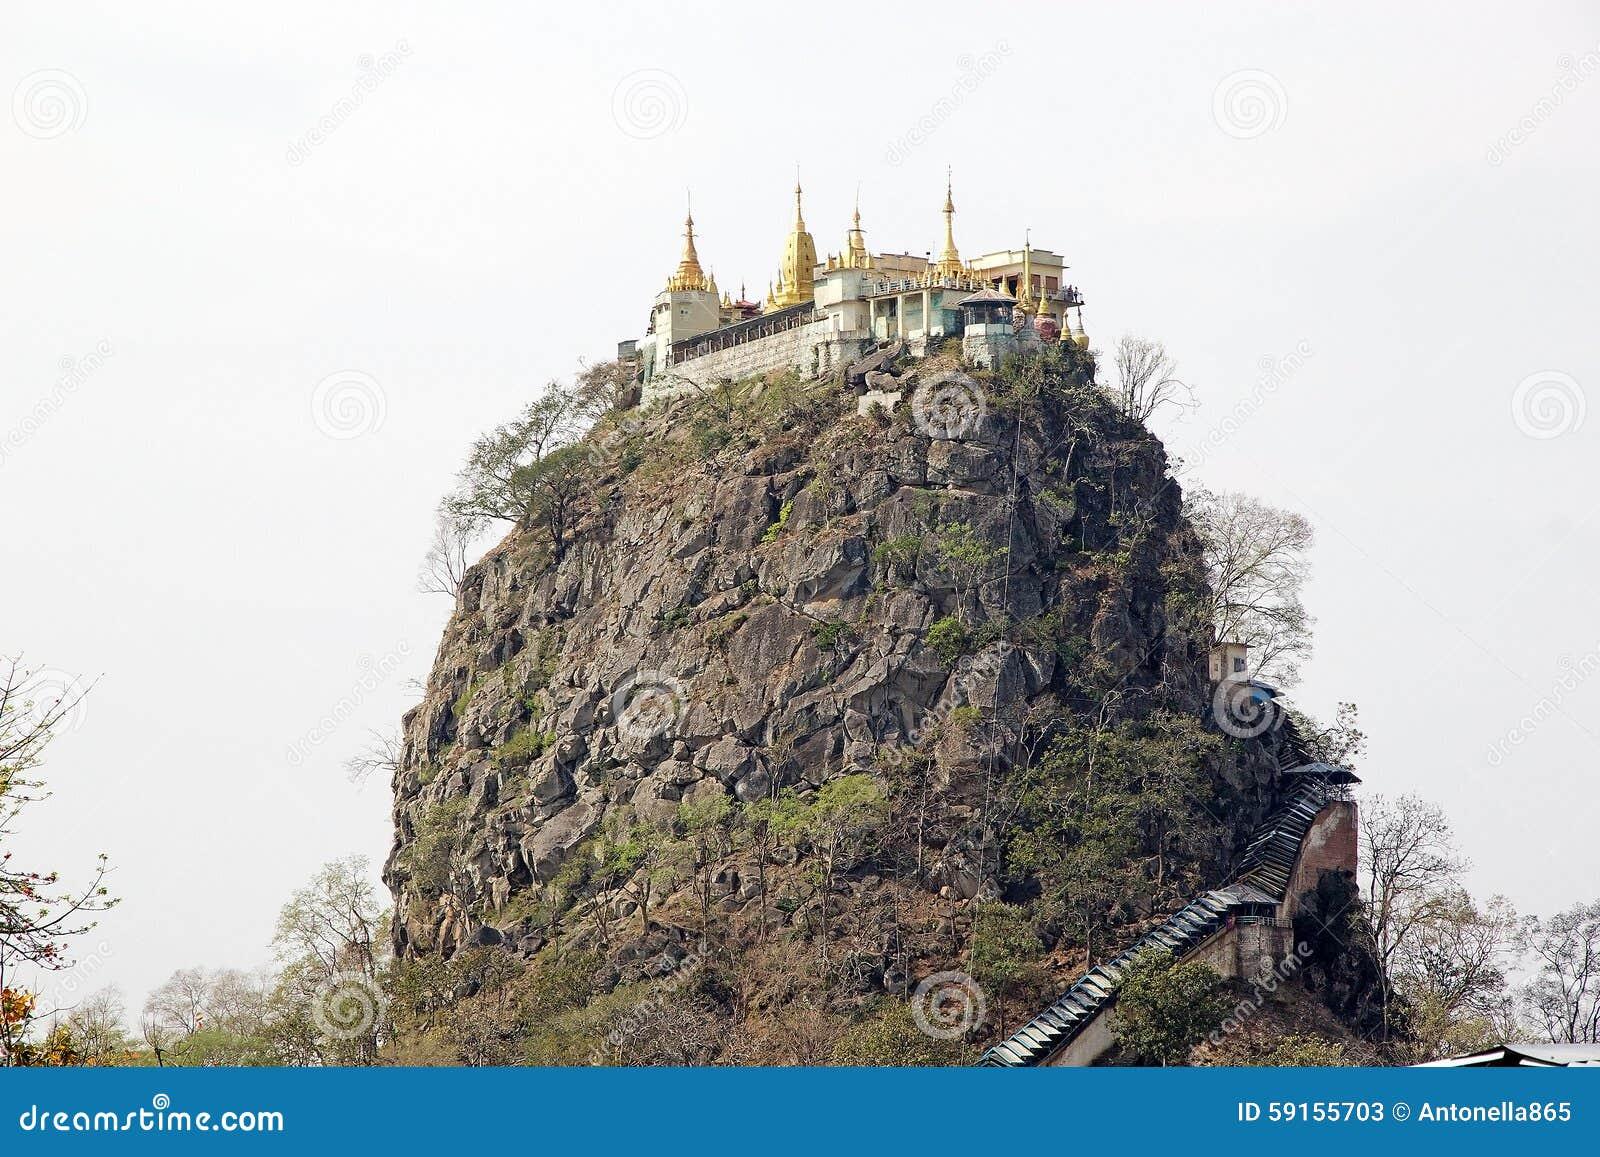 buddhist singles in summit hill Spiritual events, retreats, workshops, classes local events, worldwide retreats login 5 elements qigong w/professor  fun singles from around the world.